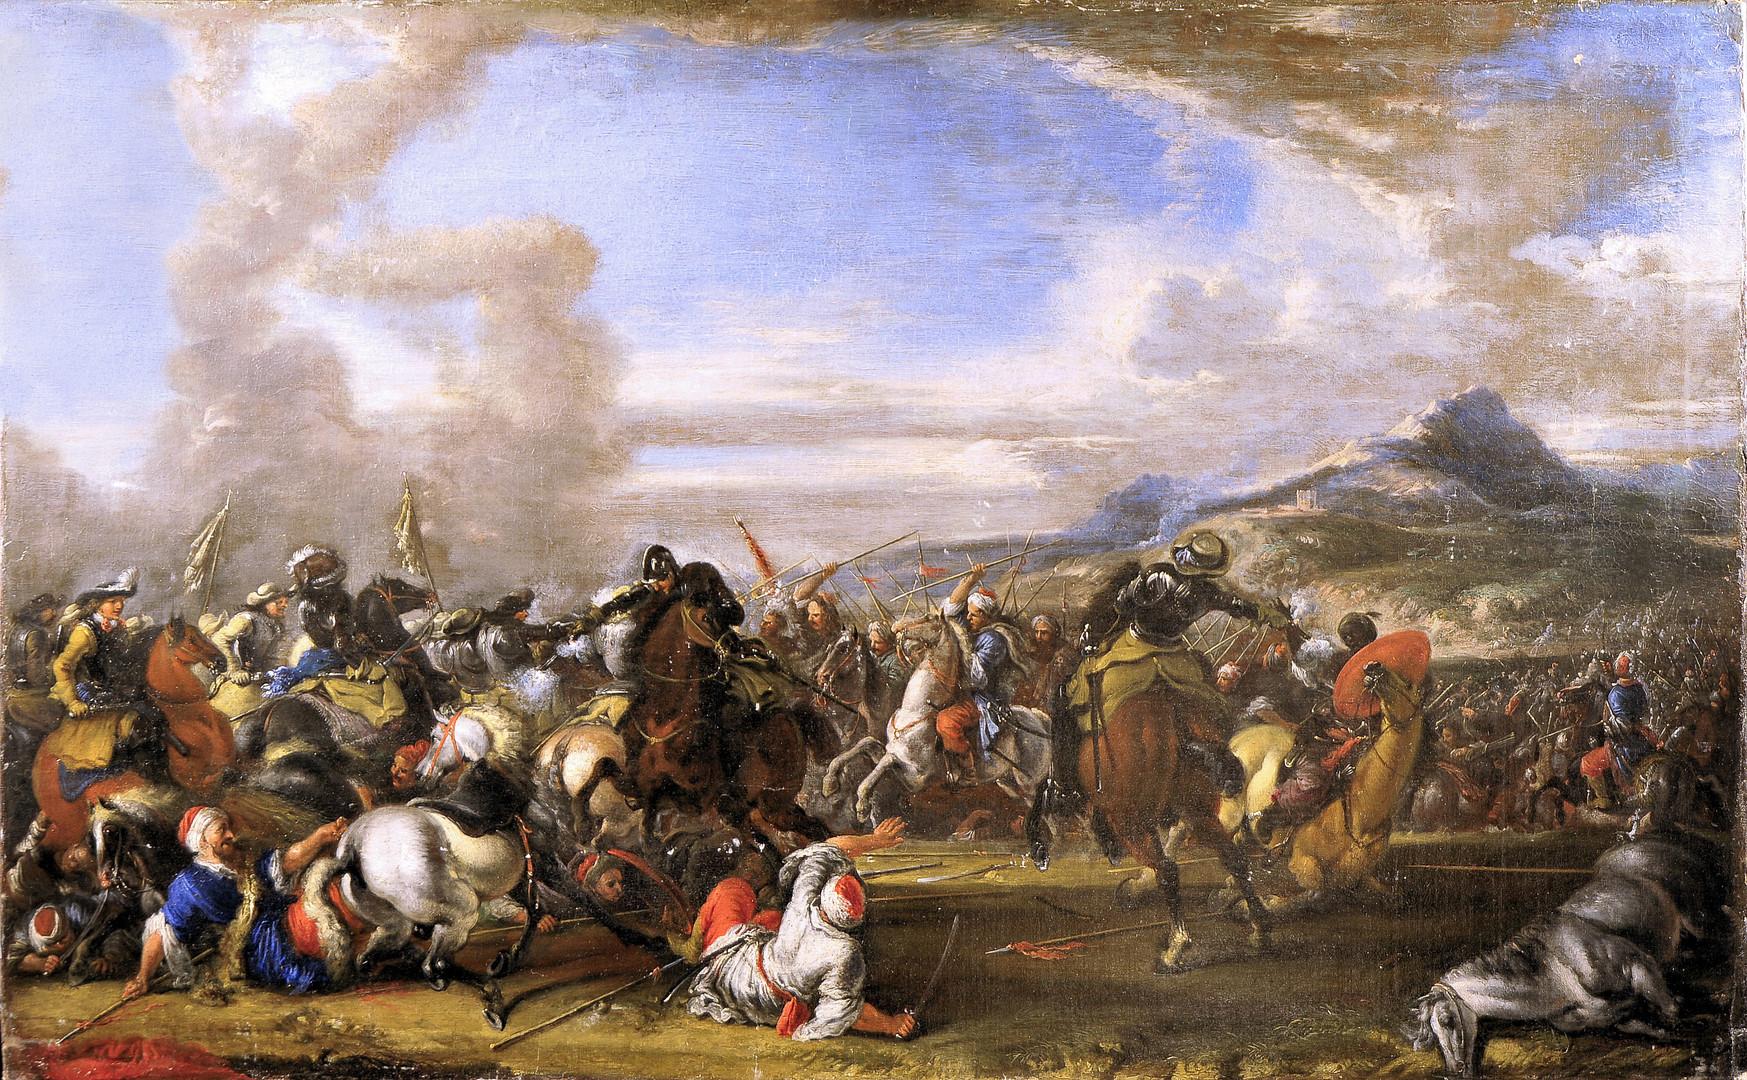 CALZA, Antonio - Battaglia tra cavalleri